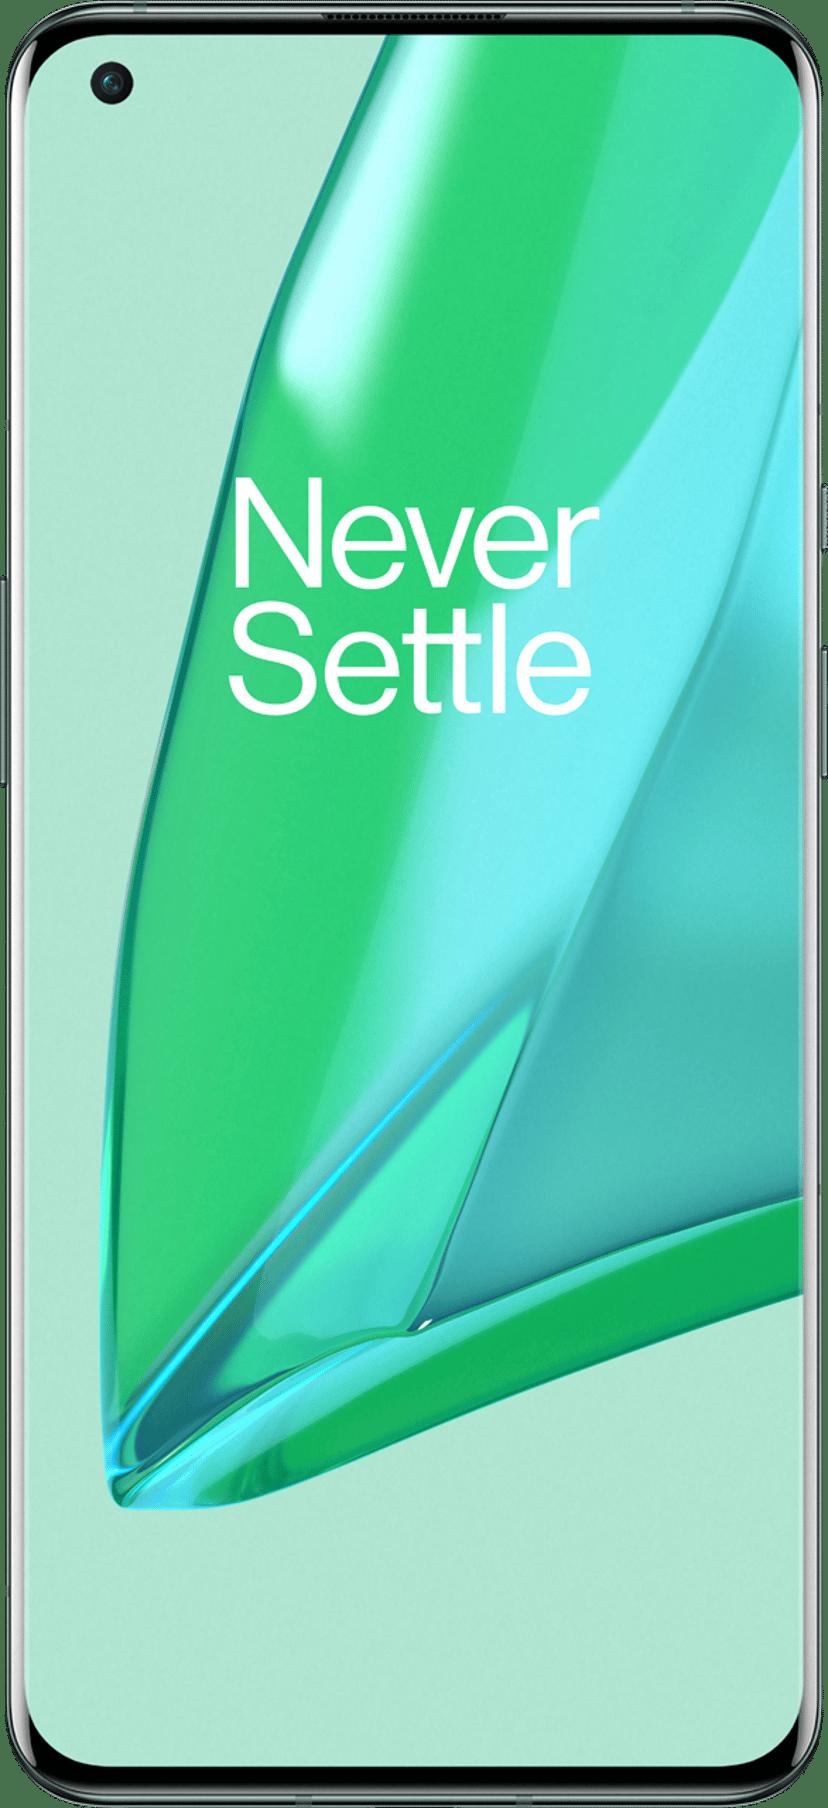 OnePlus 9 Pro 128GB Dobbelt-SIM Furugrønn